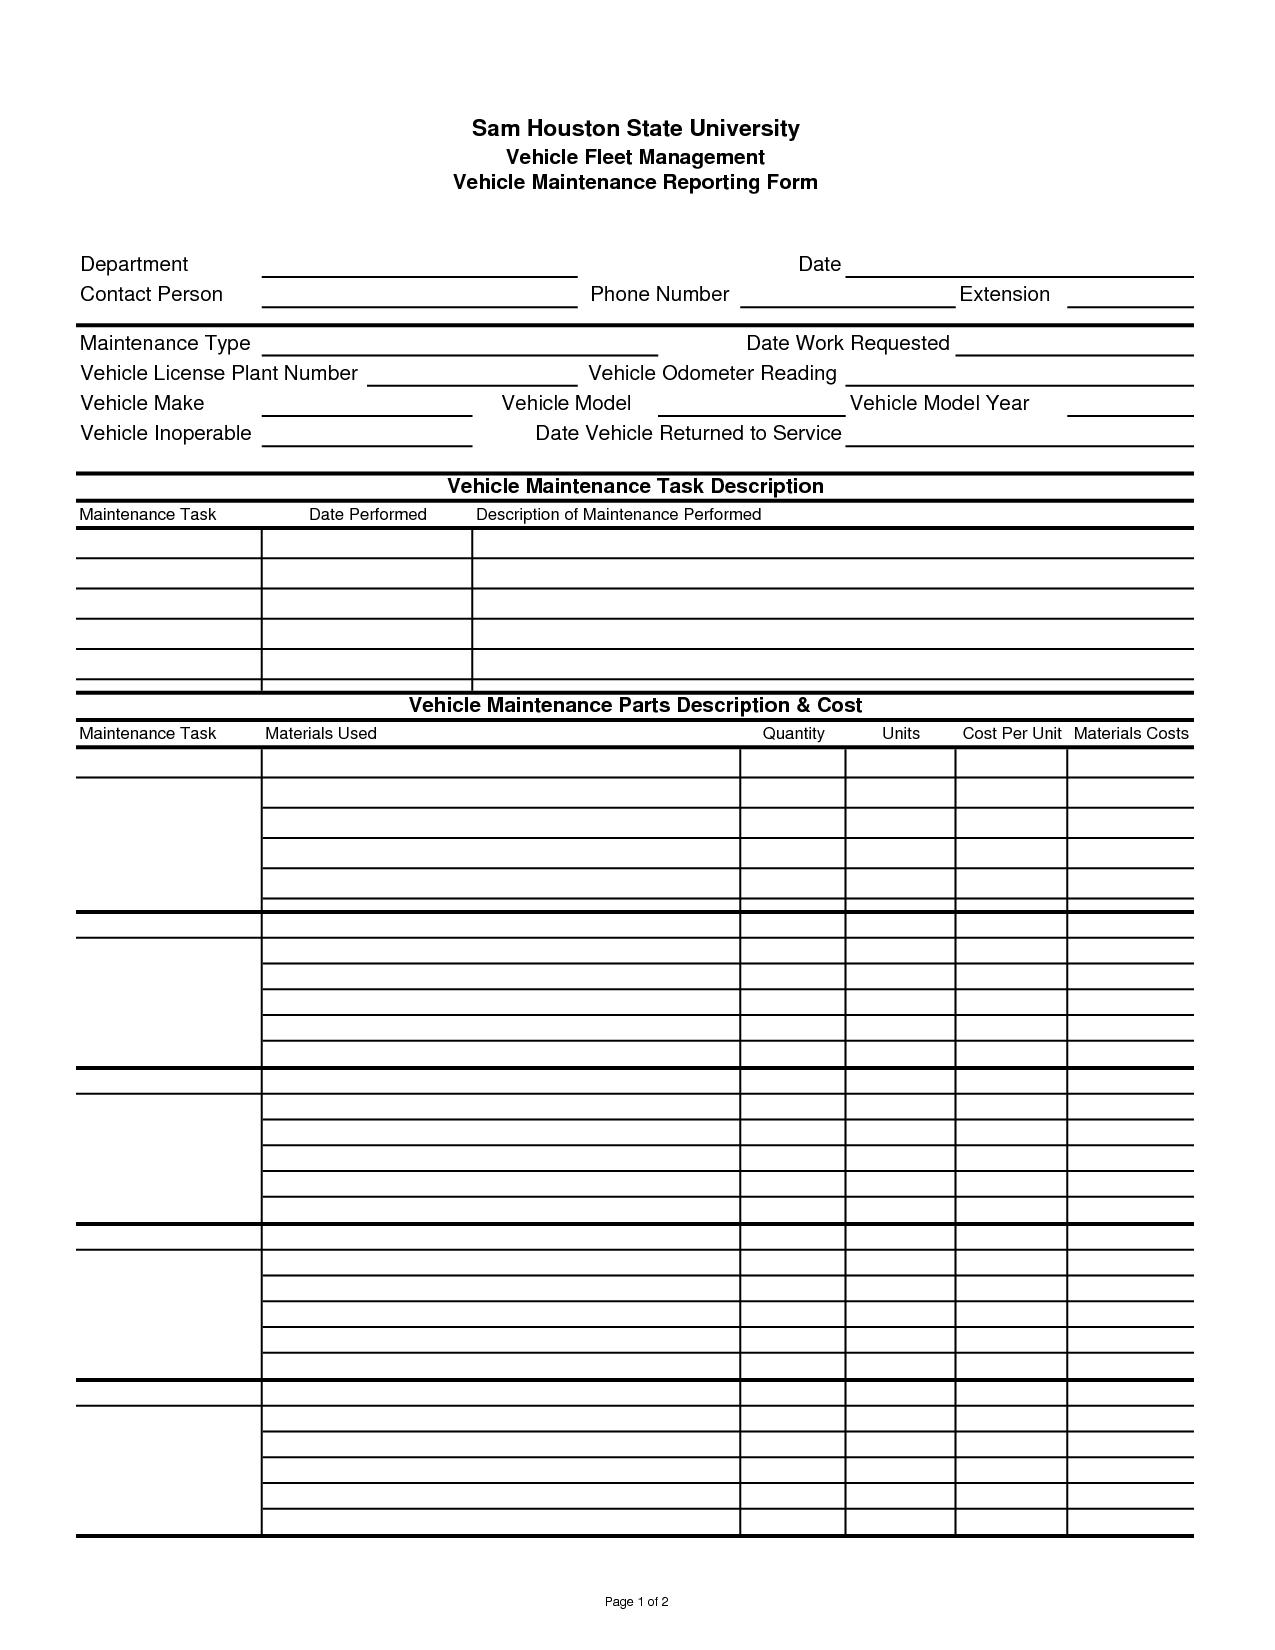 Vehicle Maintenance Tracking Spreadsheet Inside Aircraft Maintenance Tracking Spreadsheet Awesome Maintenanceing